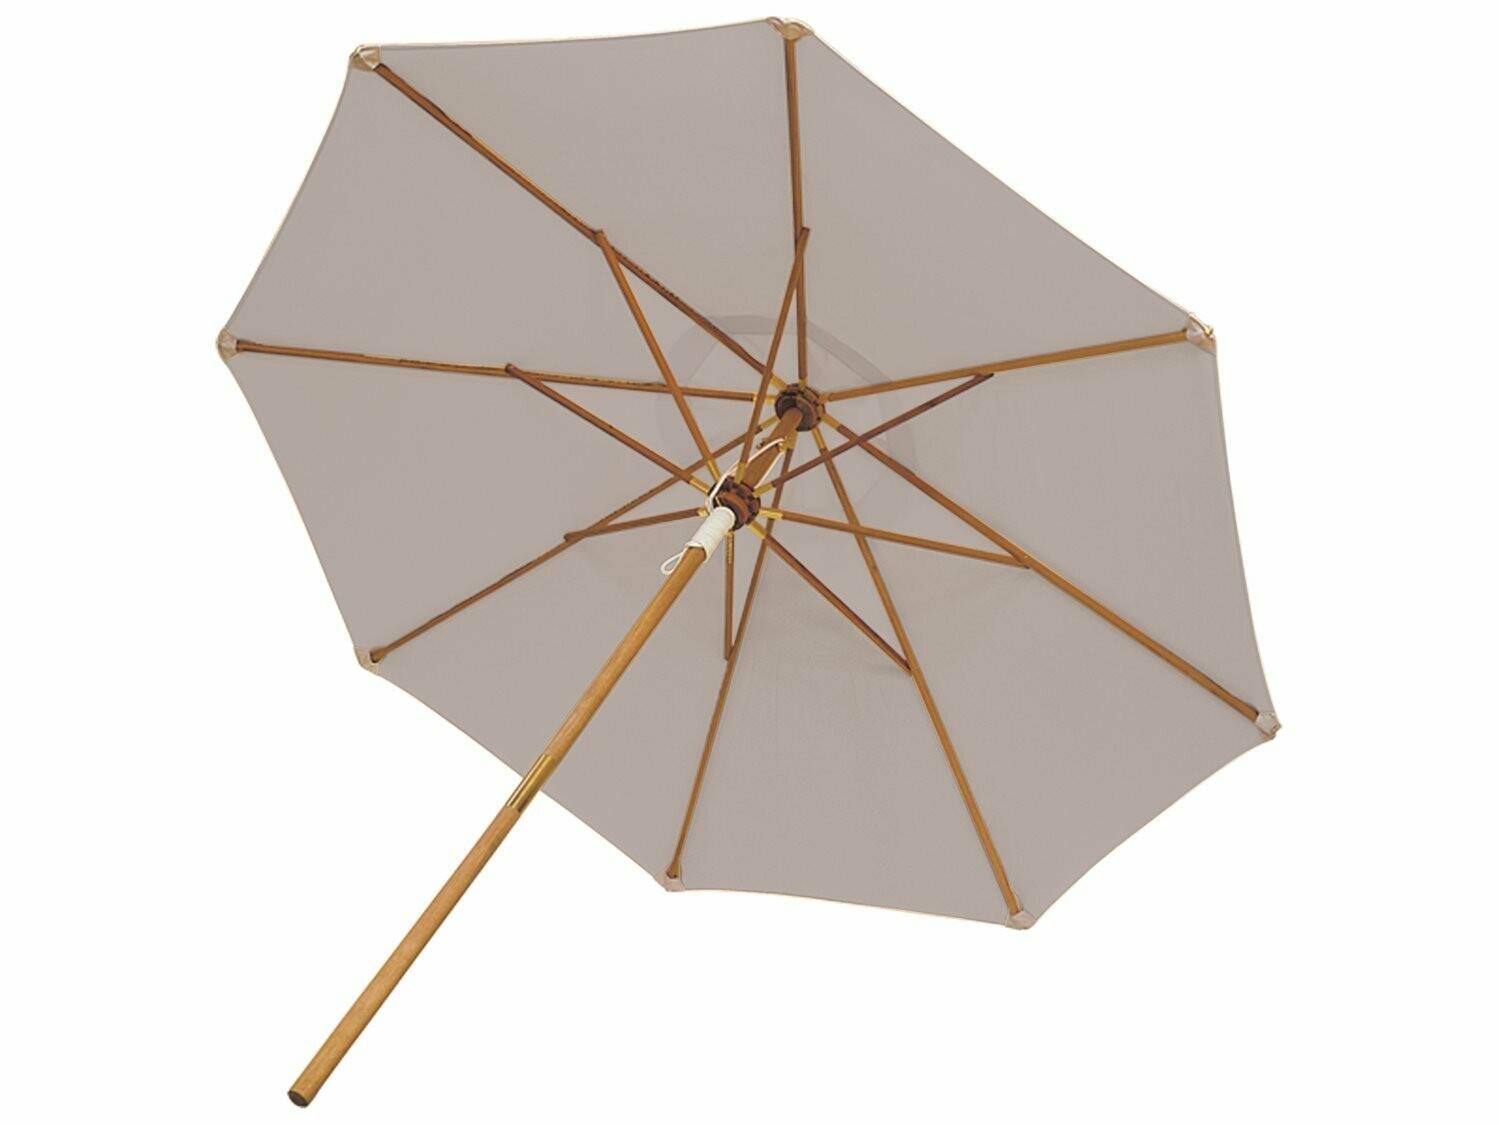 Royal Teak Collection 10' Deluxe Umbrella-Granite (Olefin Fabric)